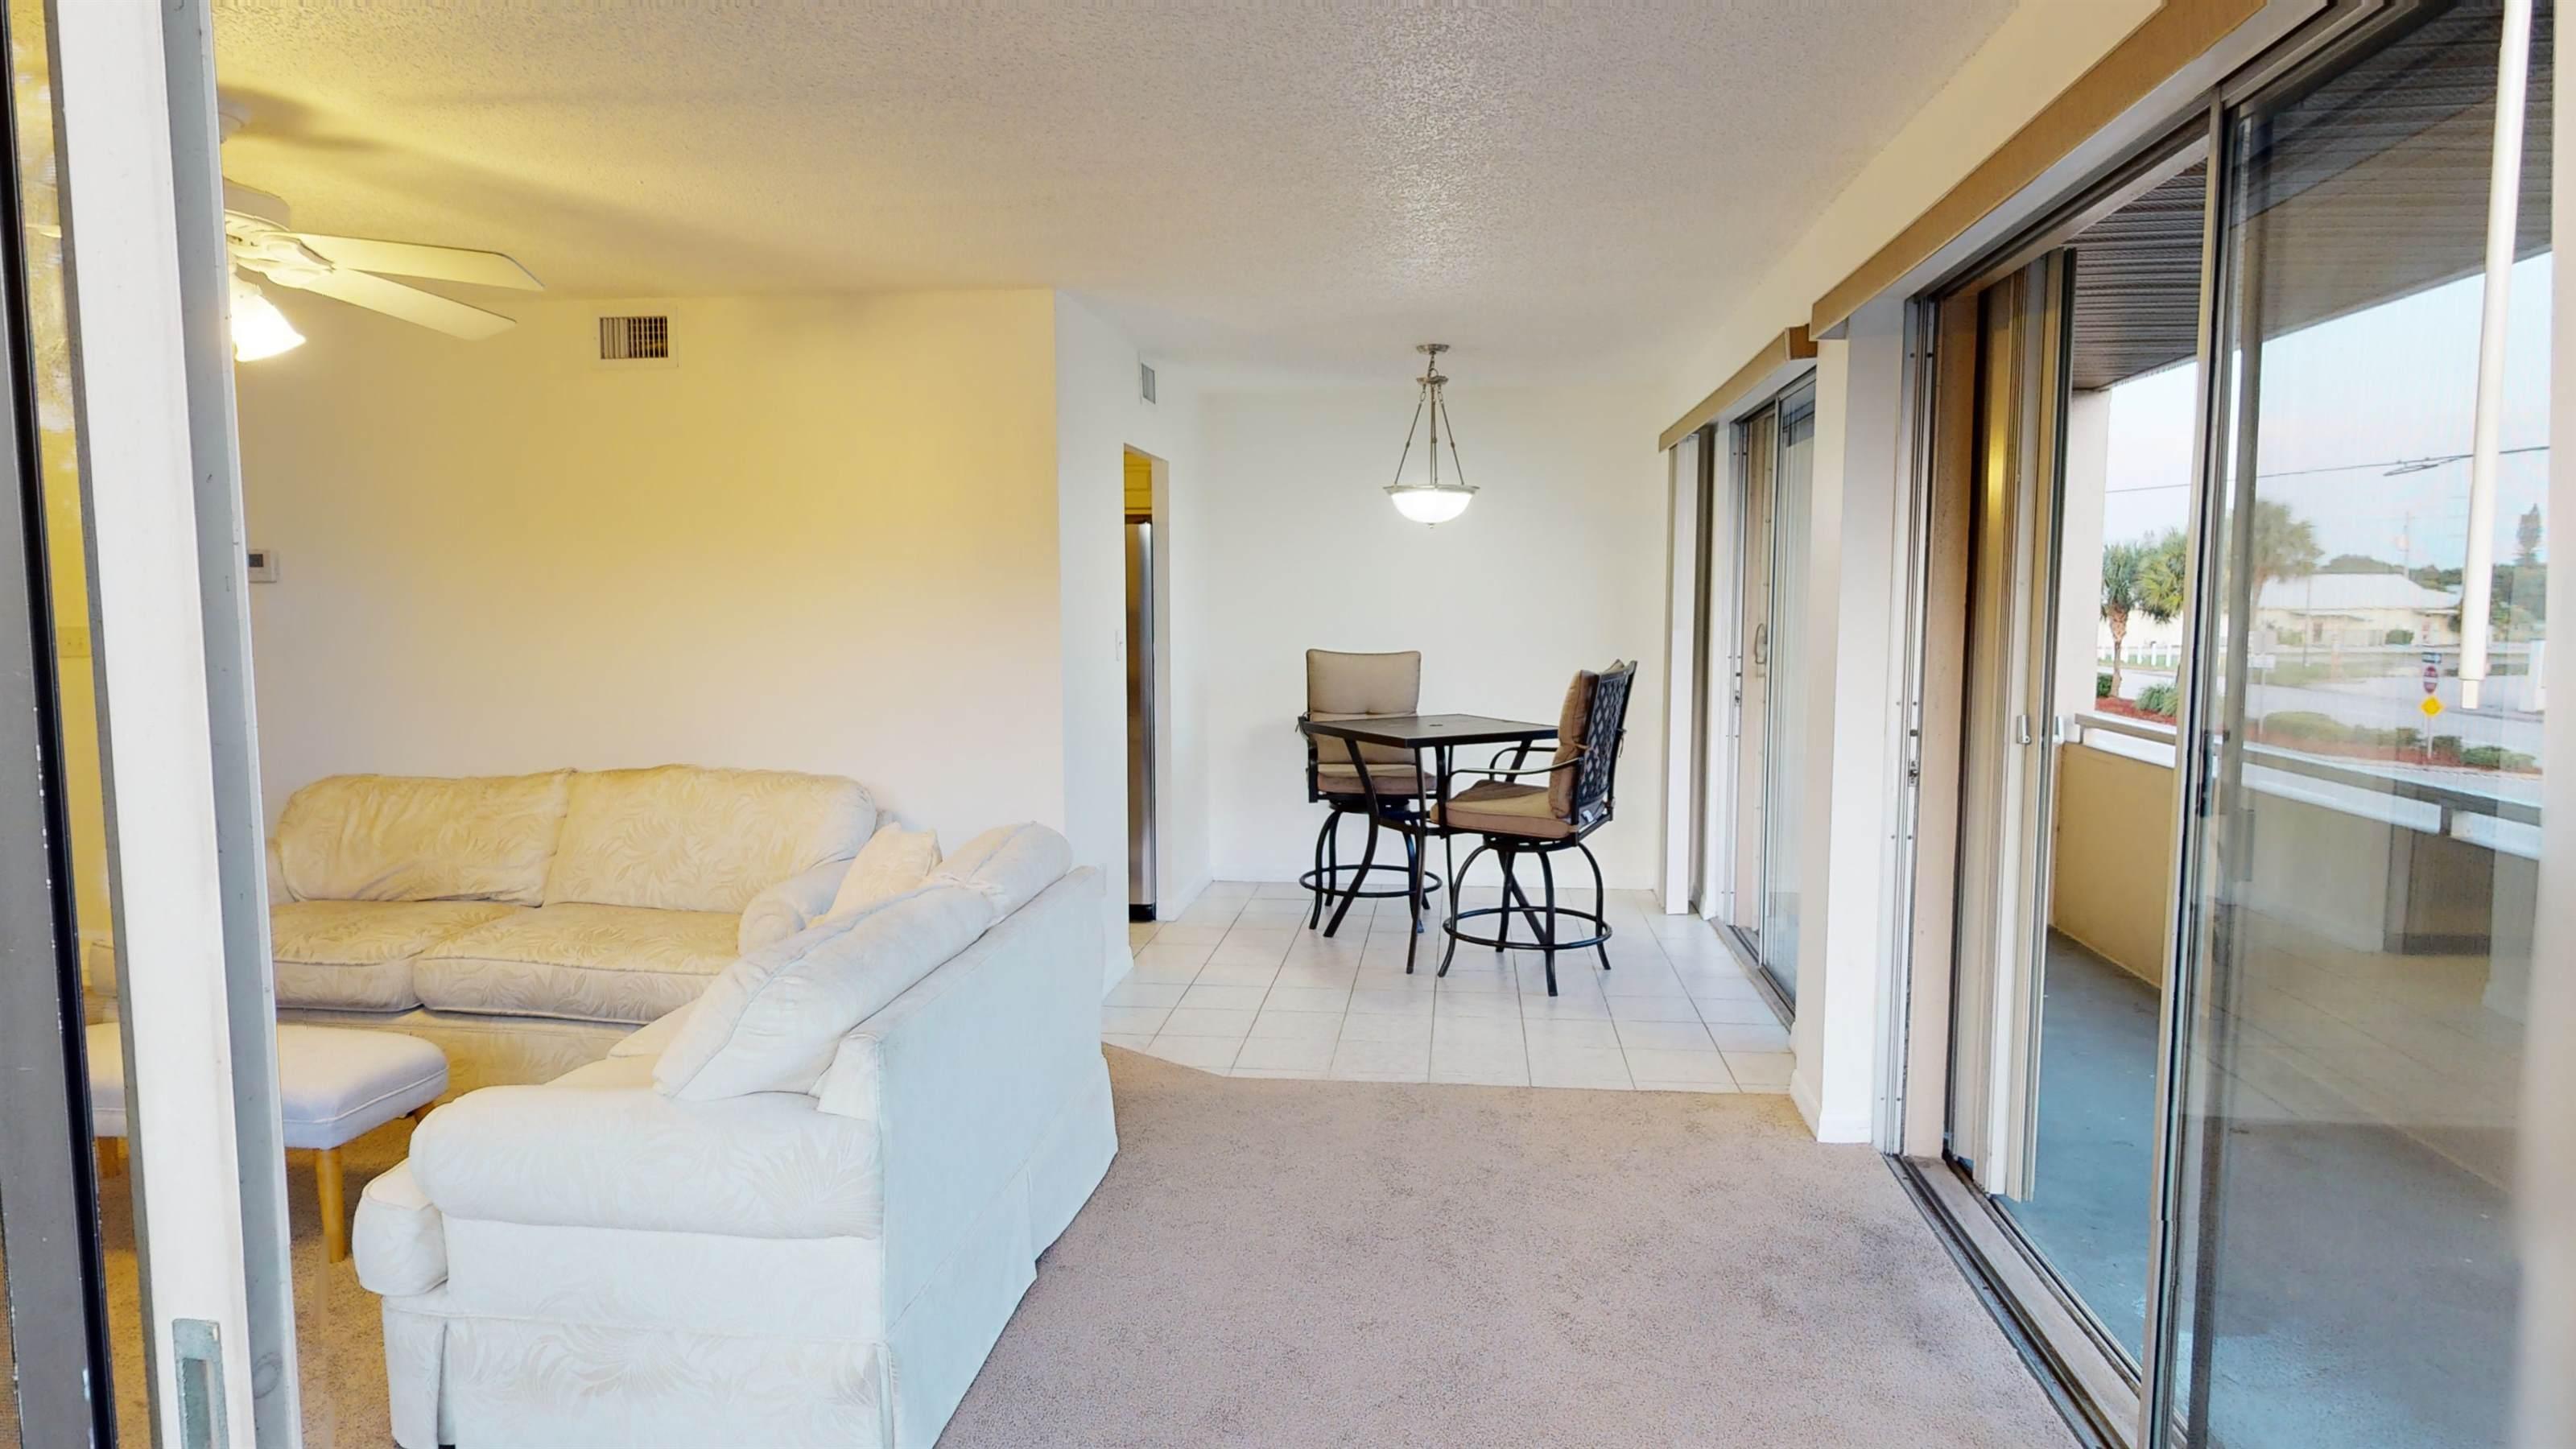 4803 Sunset Court, #104, Cape Coral, FL 33904